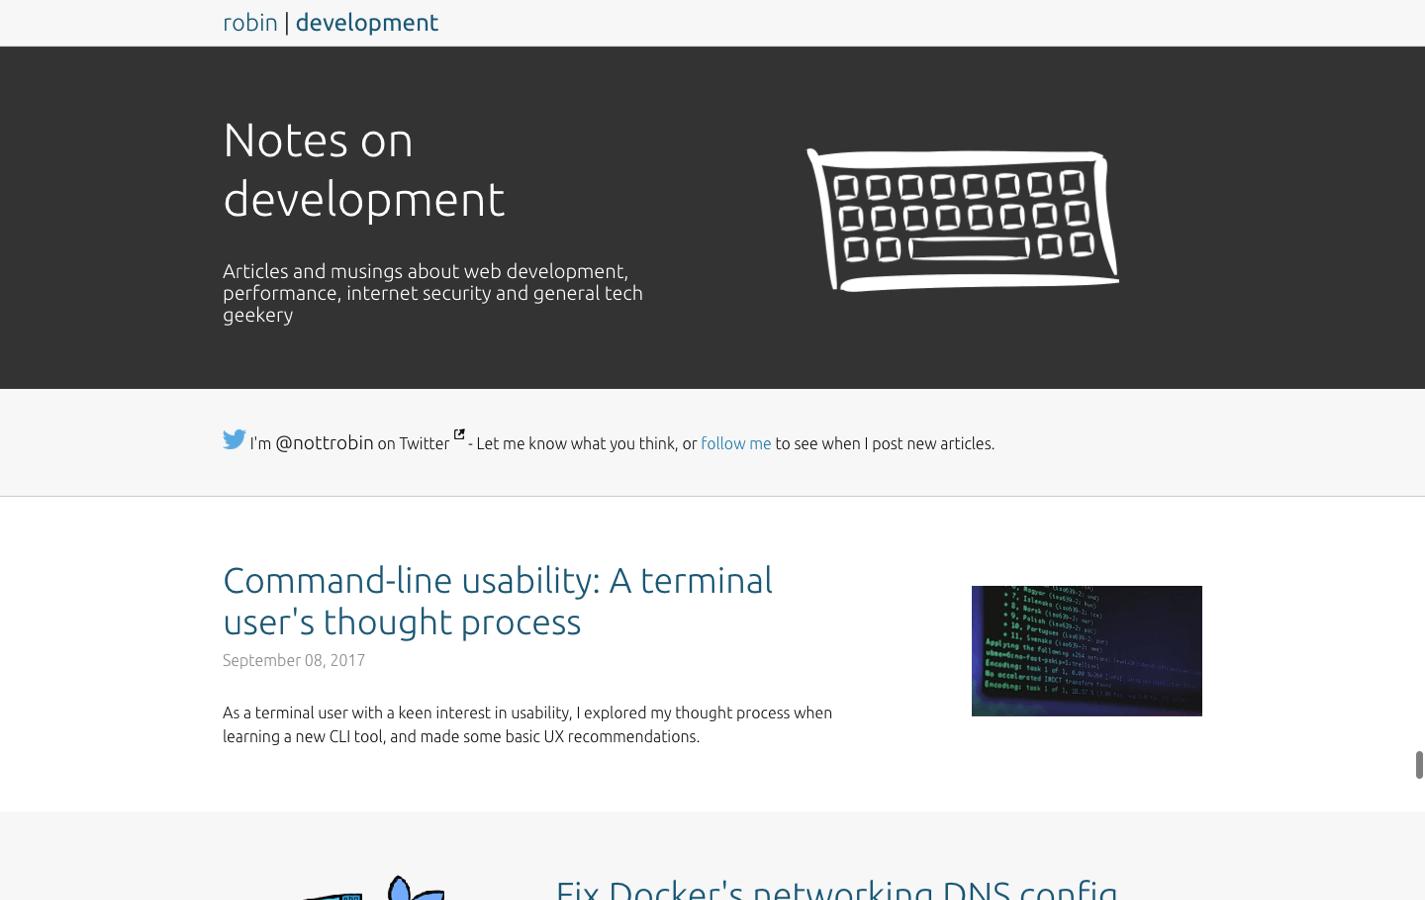 Notes on development